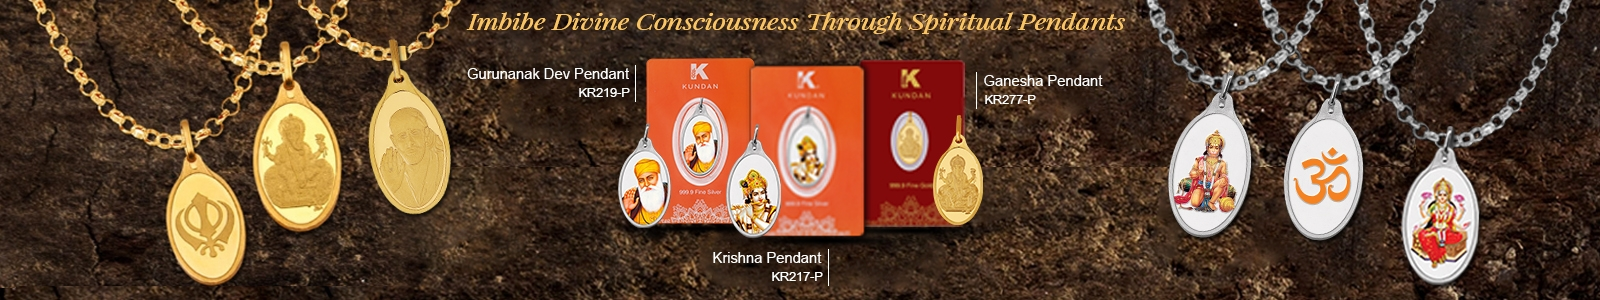 Imbibe Divine Consciousness Through Spiritual Pendants